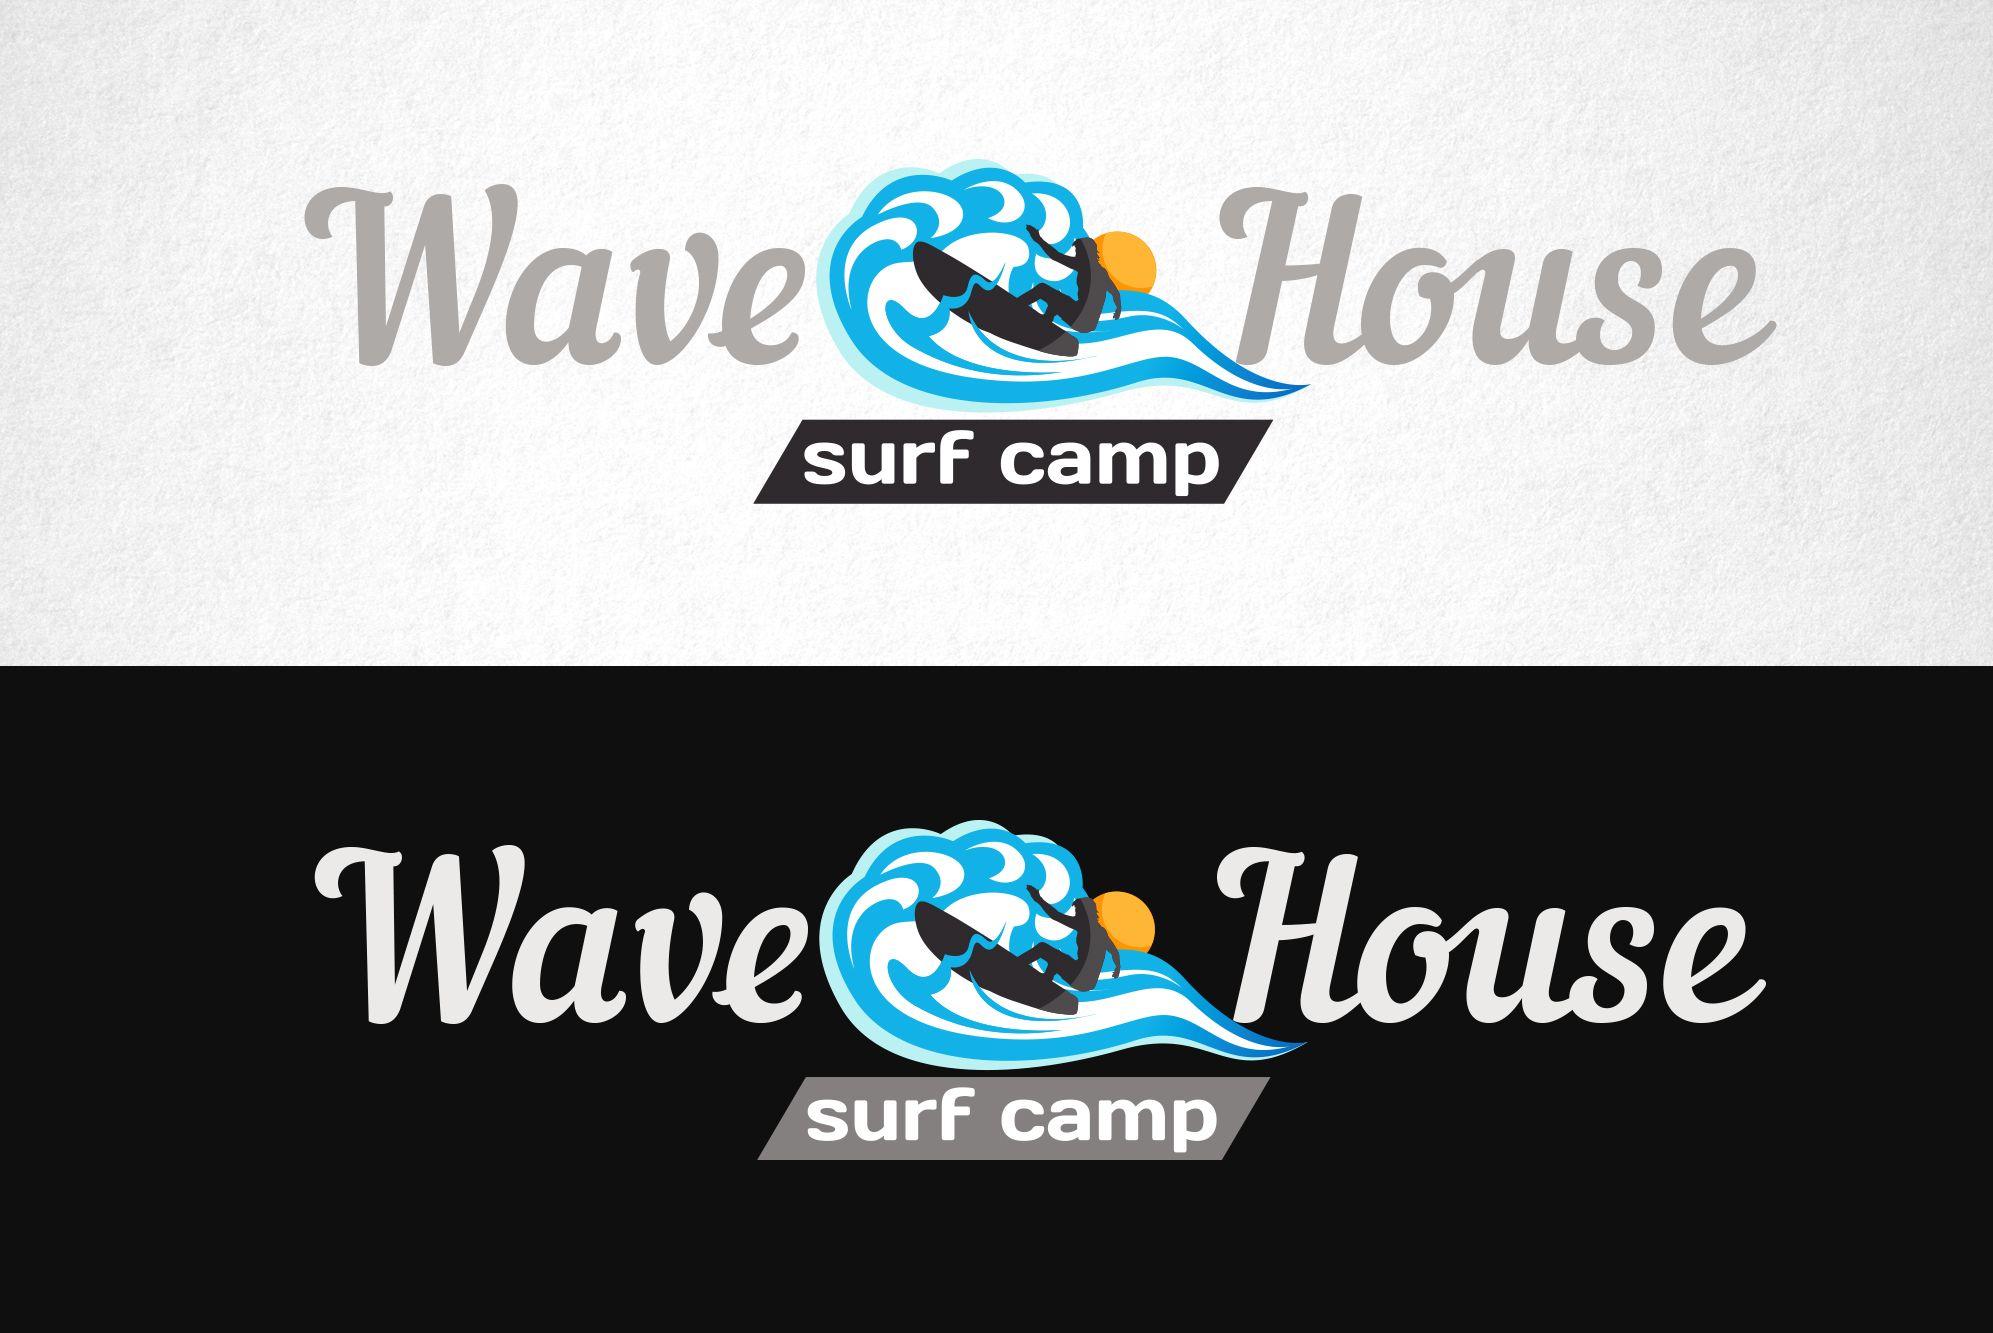 Редизайн логотипа для серф-кэмпа на Бали - дизайнер funkielevis